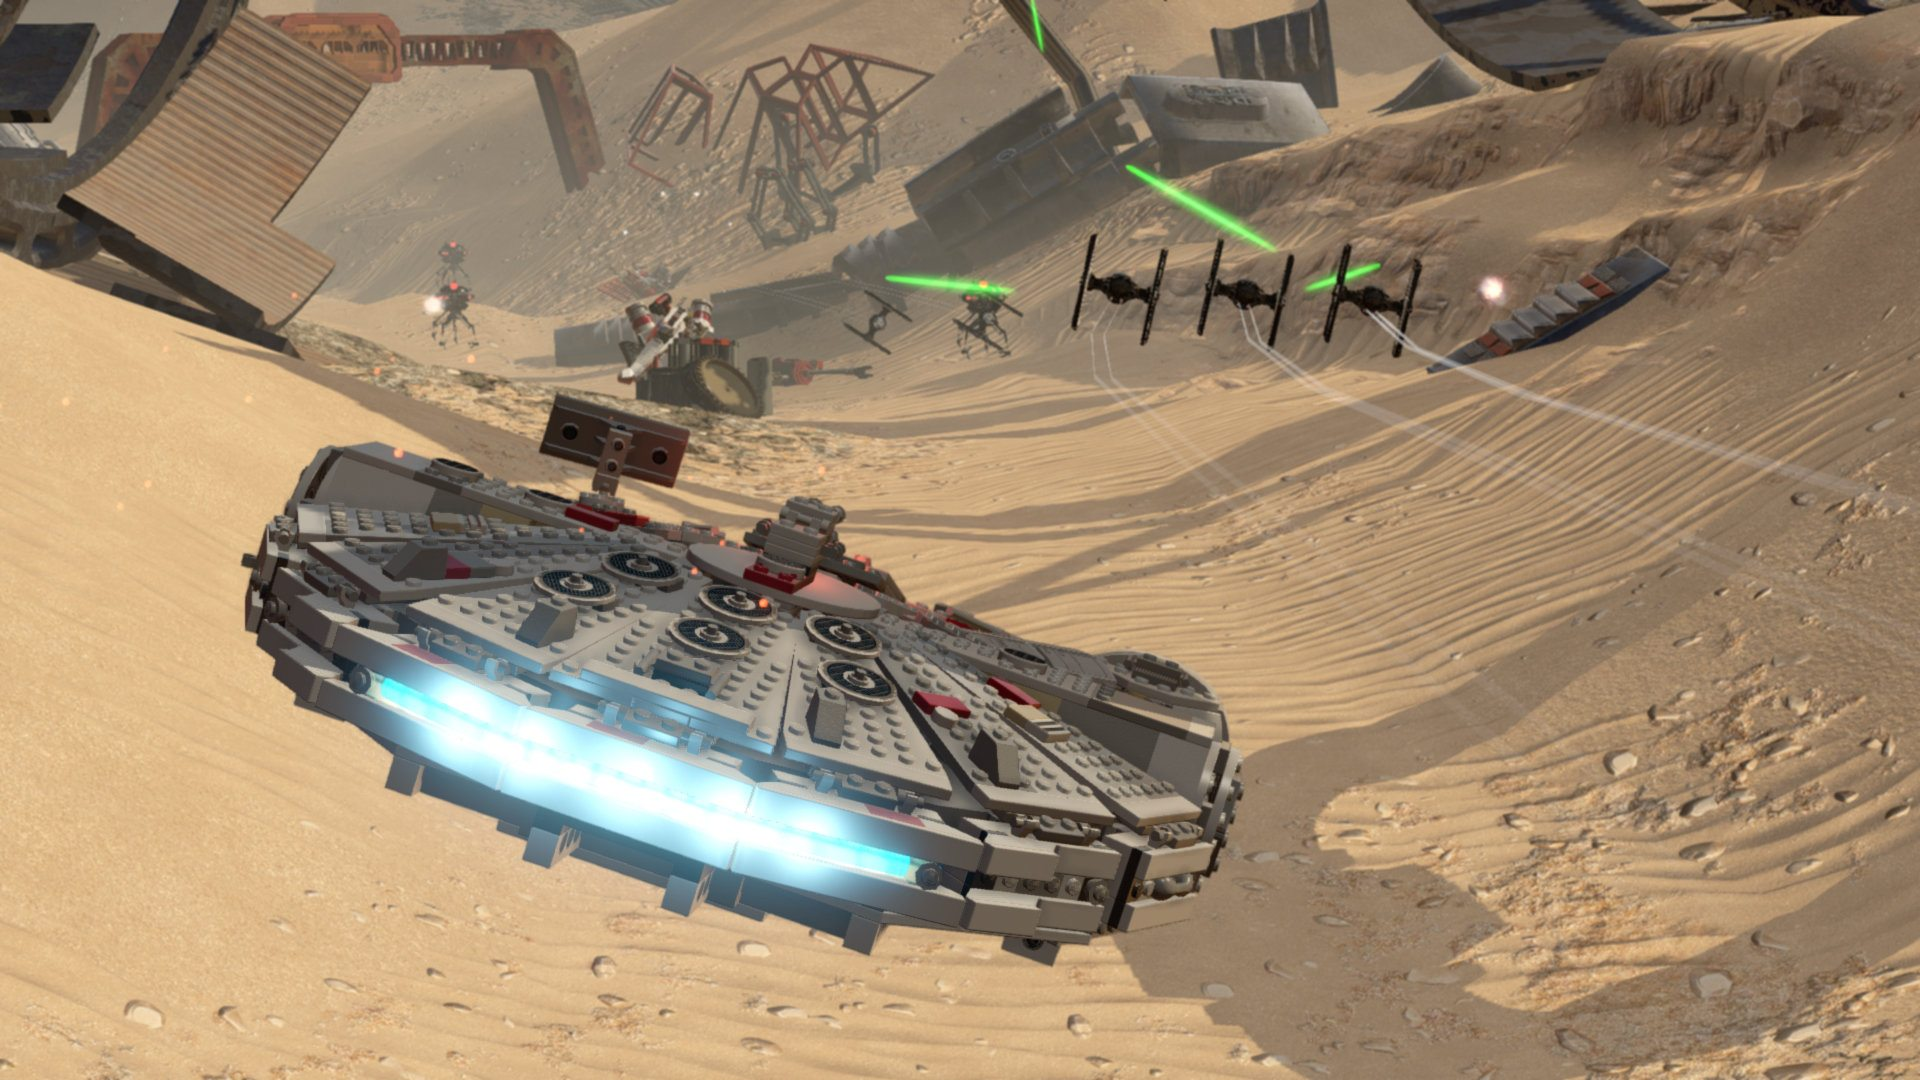 Lego-star-wars-force-awakens-recensione